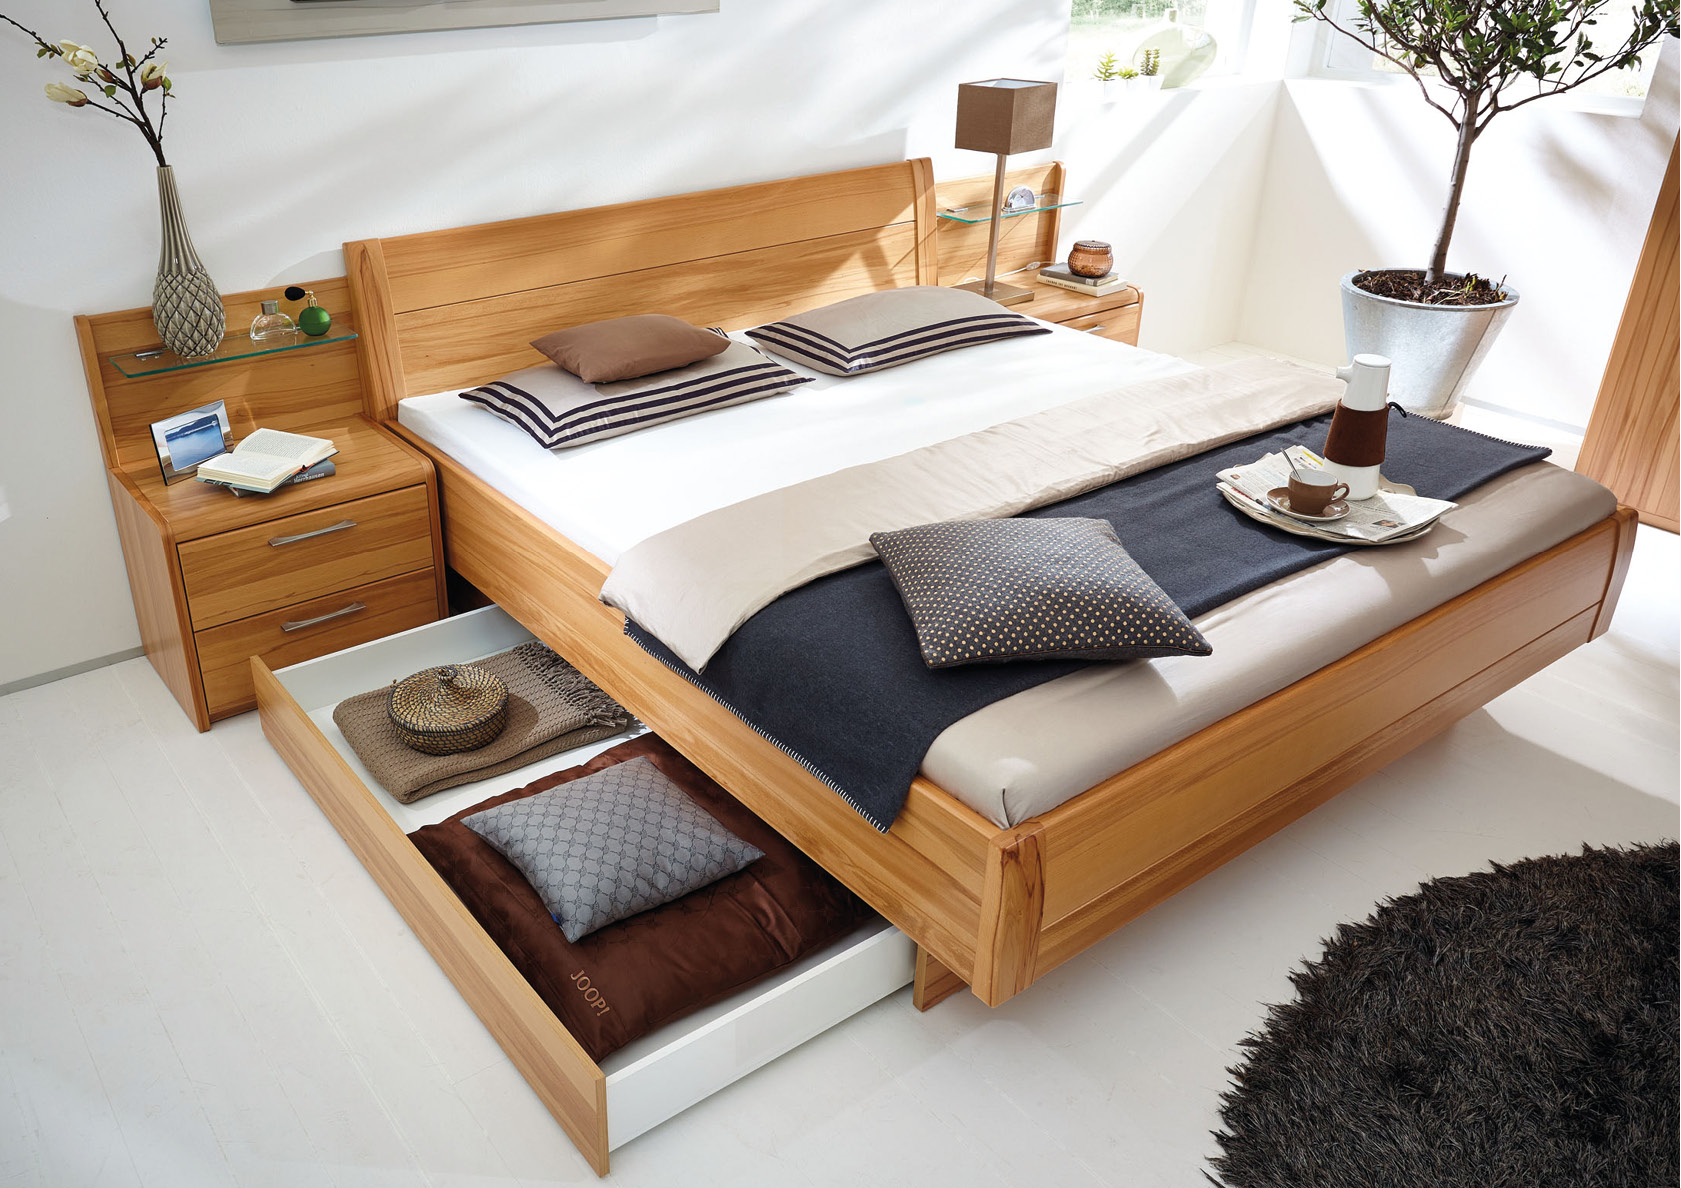 kompaktbett paris peter kling gmbh das bettenhaus m bel kling in pirmasens. Black Bedroom Furniture Sets. Home Design Ideas